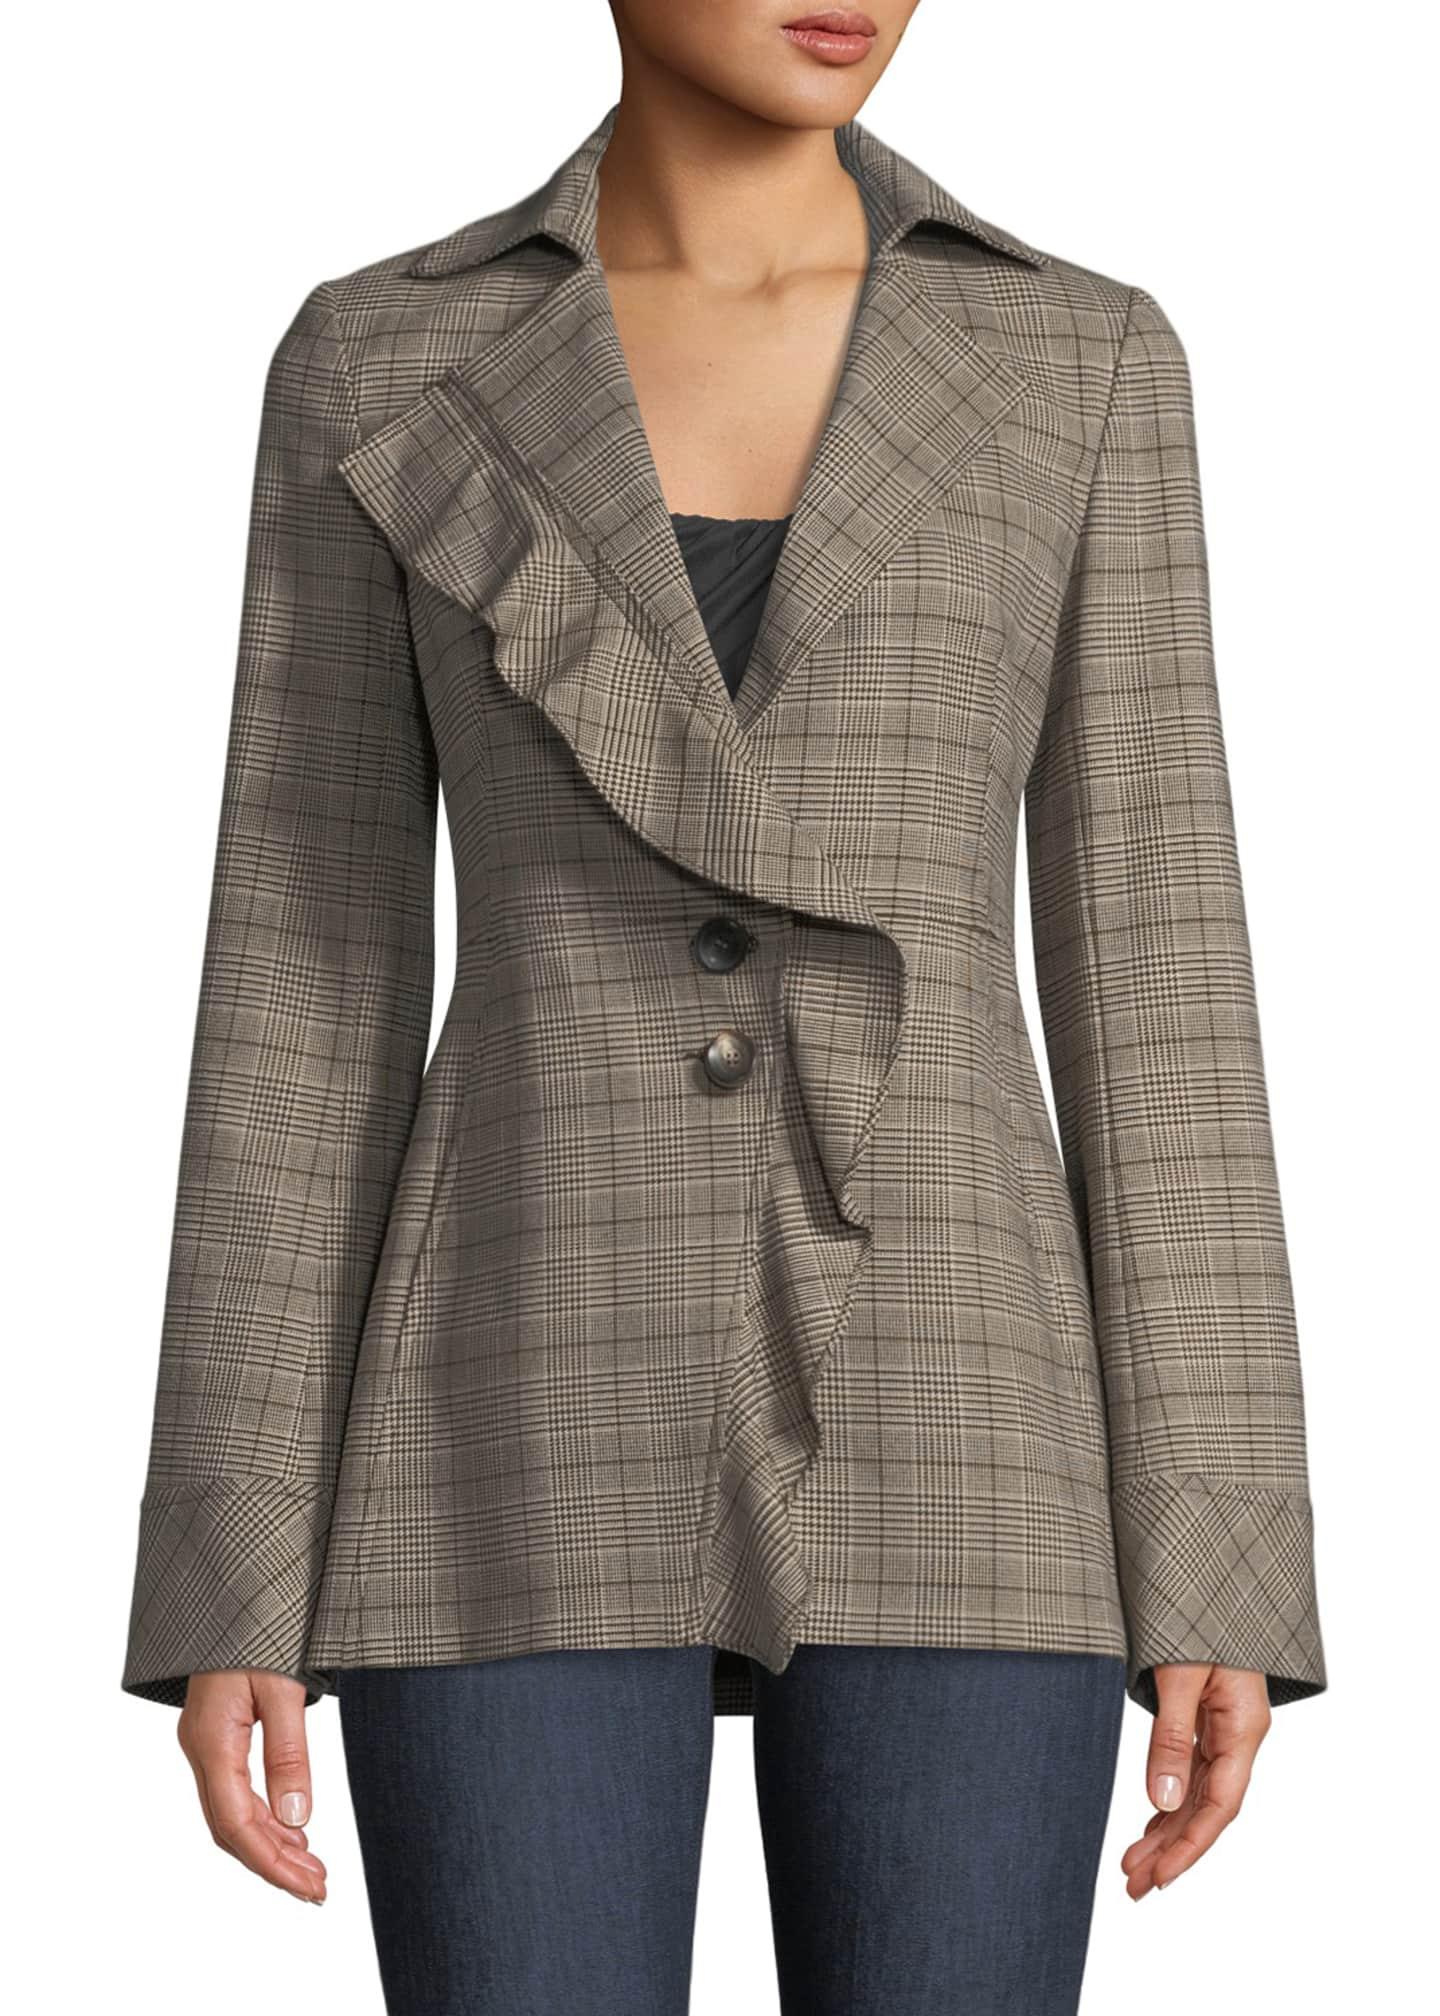 Nanette Lepore Jailbird Plaid & Ruffle Jacket